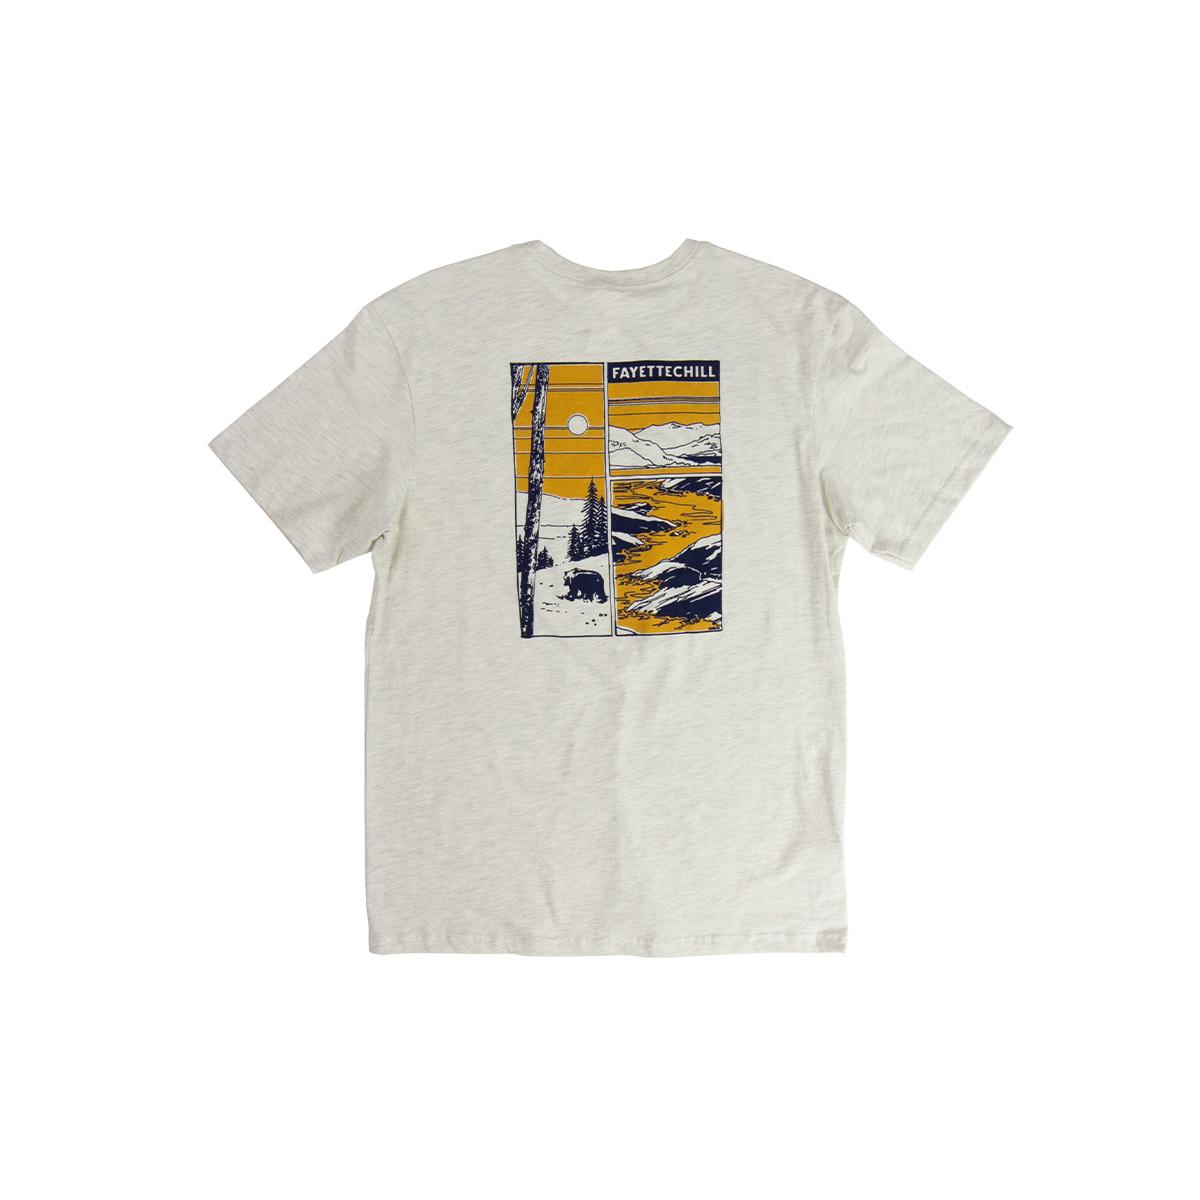 Fayettechill Men's Kuma Short Sleeve